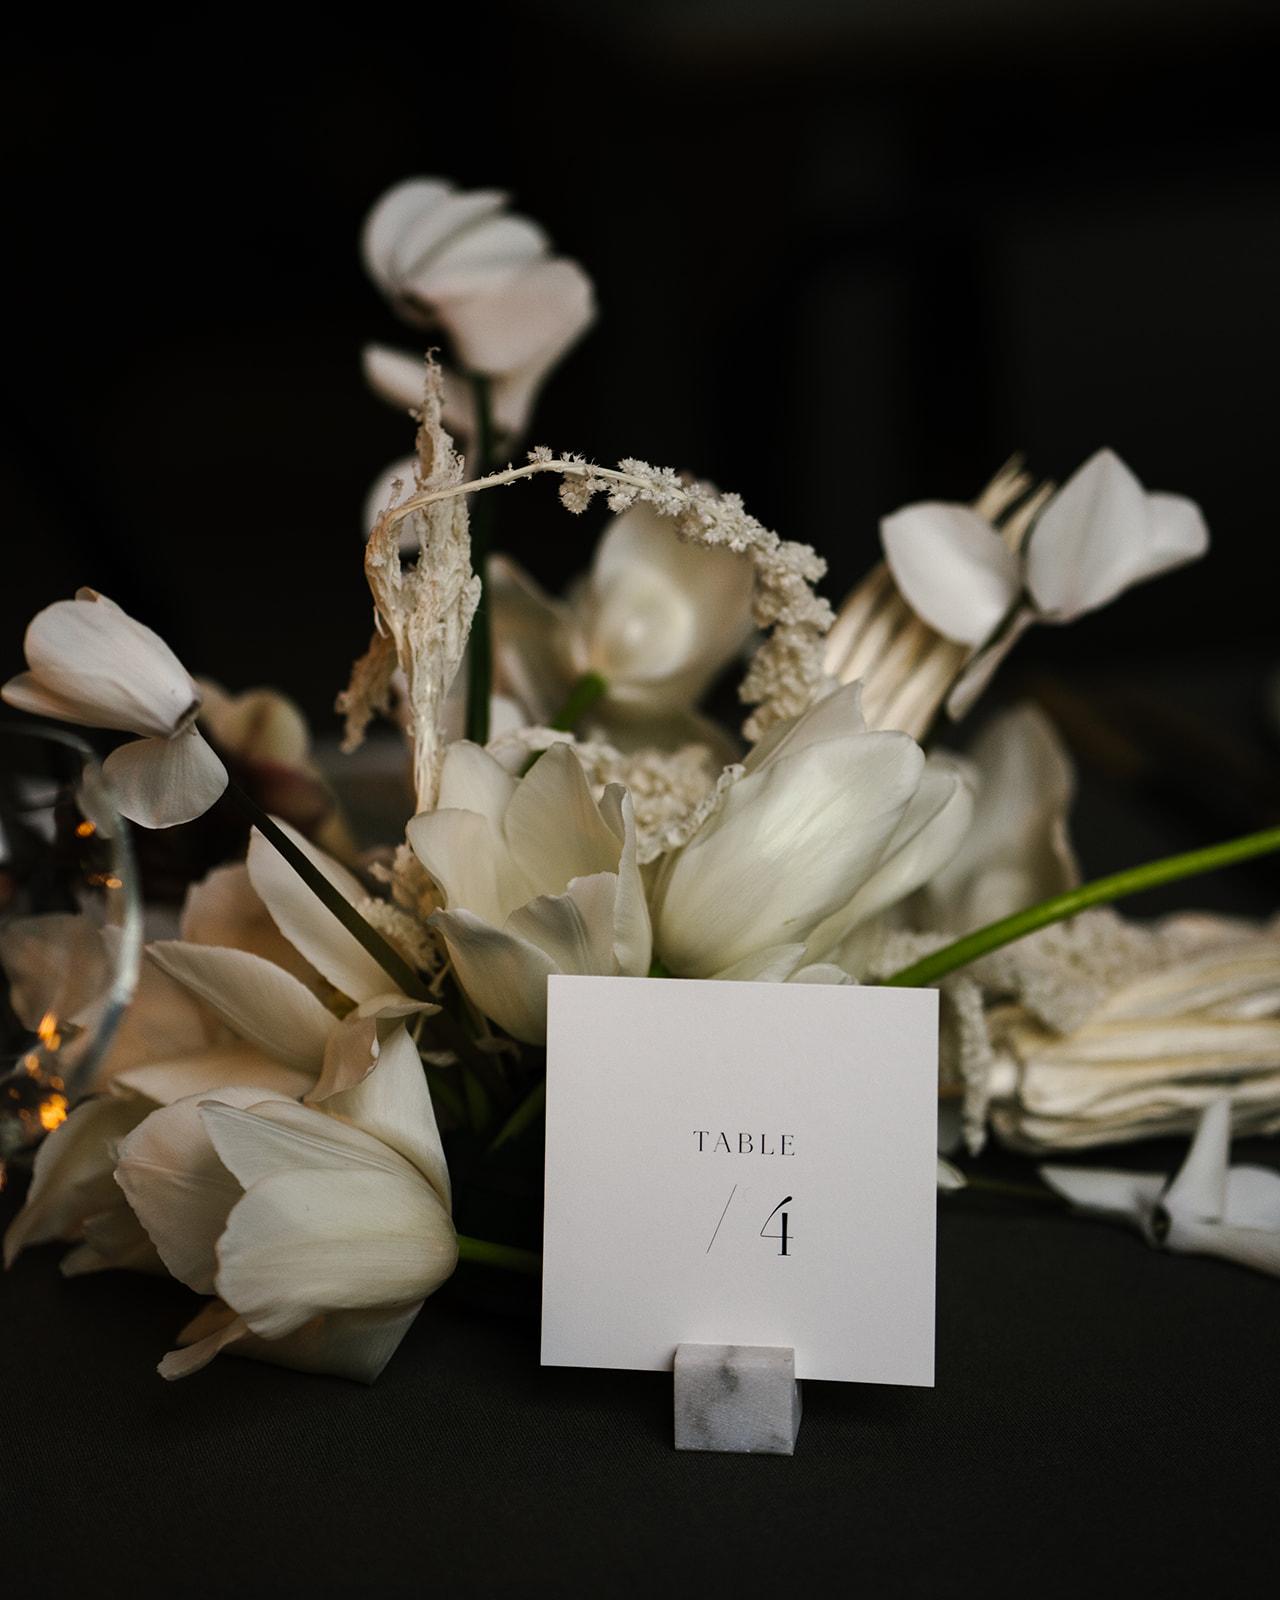 Hilde-Stories-Jessica-Williams-Photography-Still-Life-Flowers-85.jpg